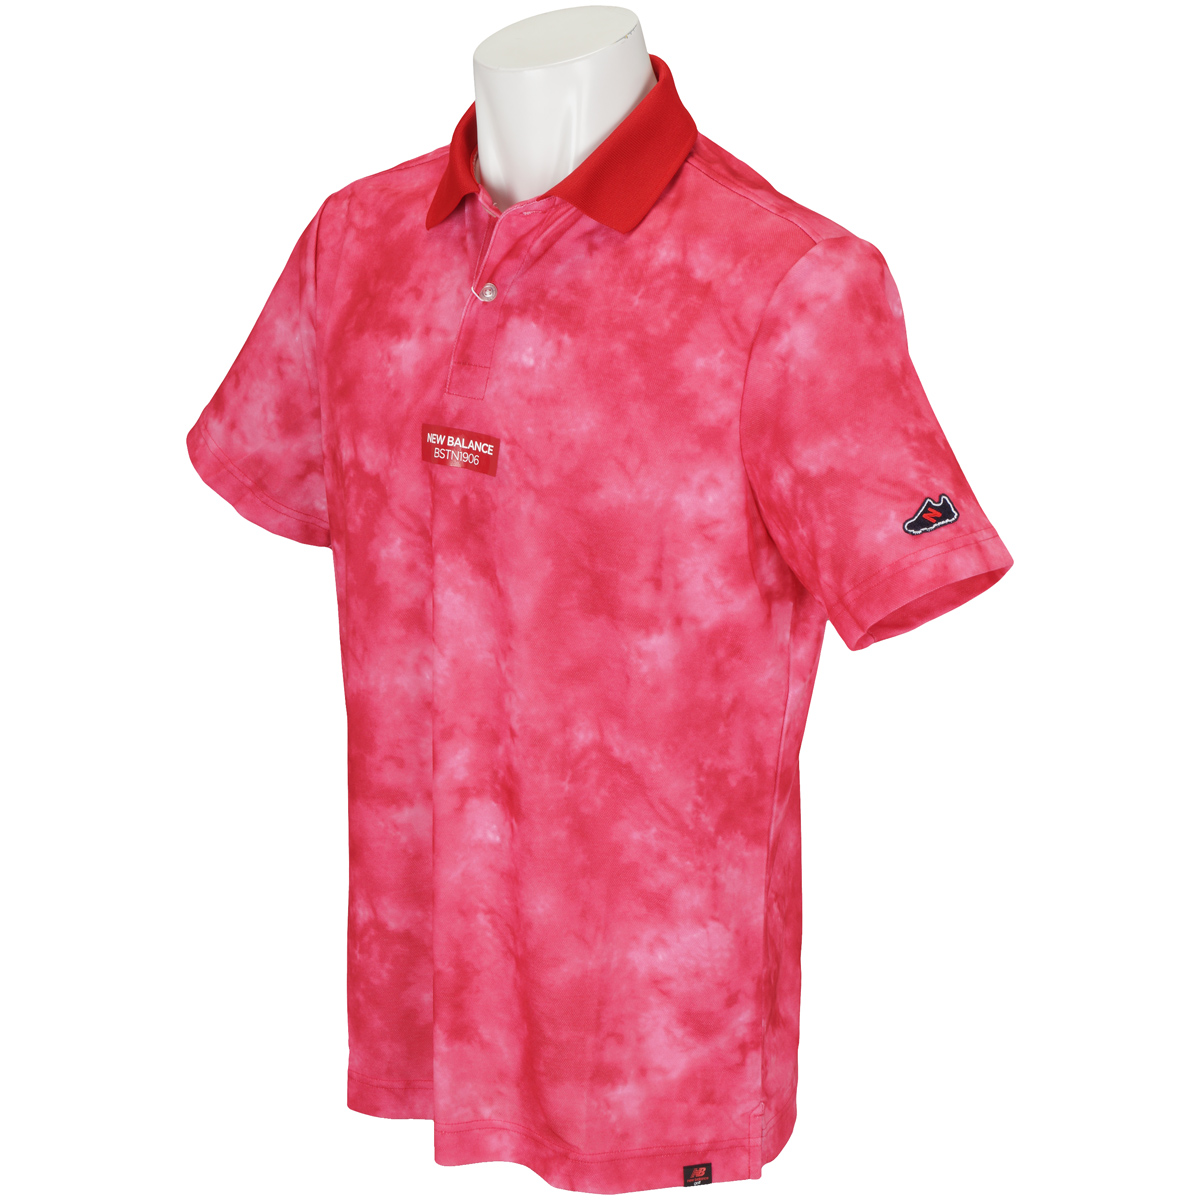 METRO 鹿の子 タイダイプリント半袖ポロシャツ